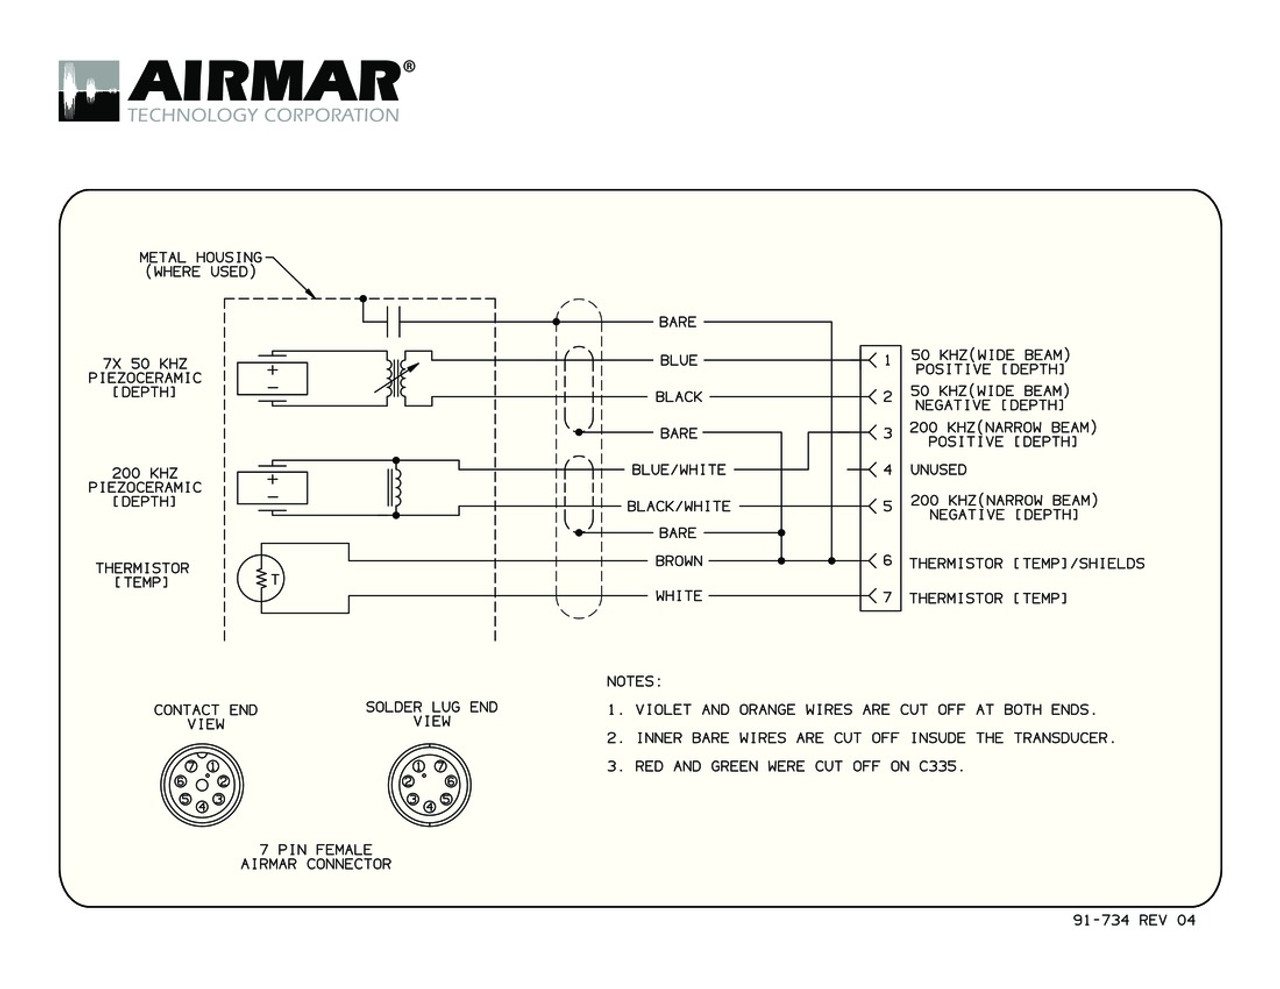 medium resolution of depth temperature 1kw transducers with simrad 7 pin connector airmar wiring diagram